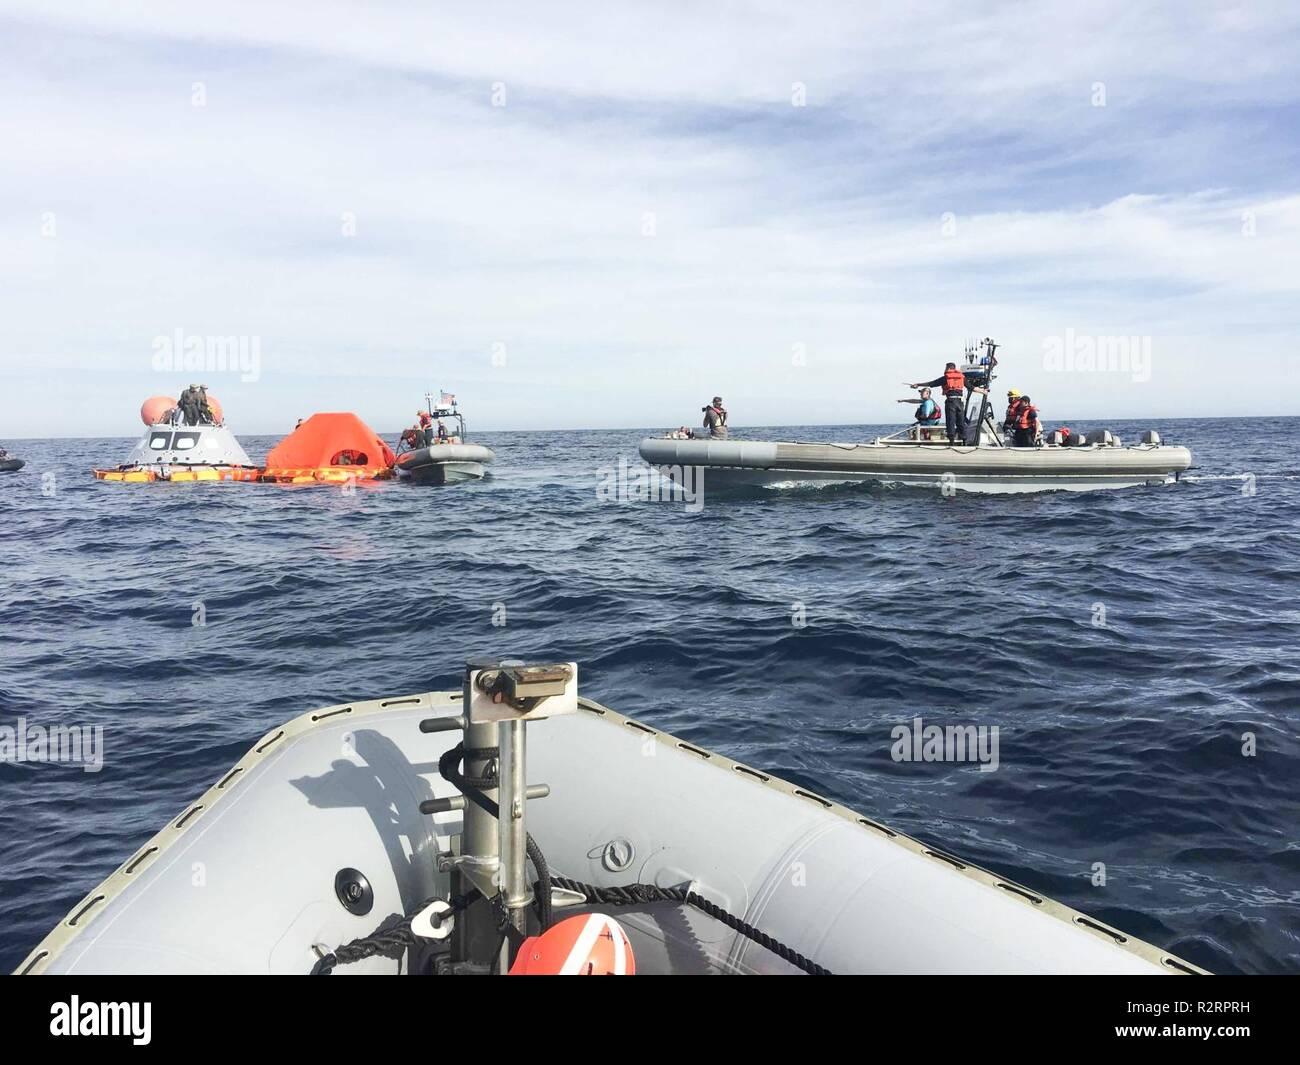 PACIFIC OCEAN (Nov  1, 2018) - Sailors from amphibious